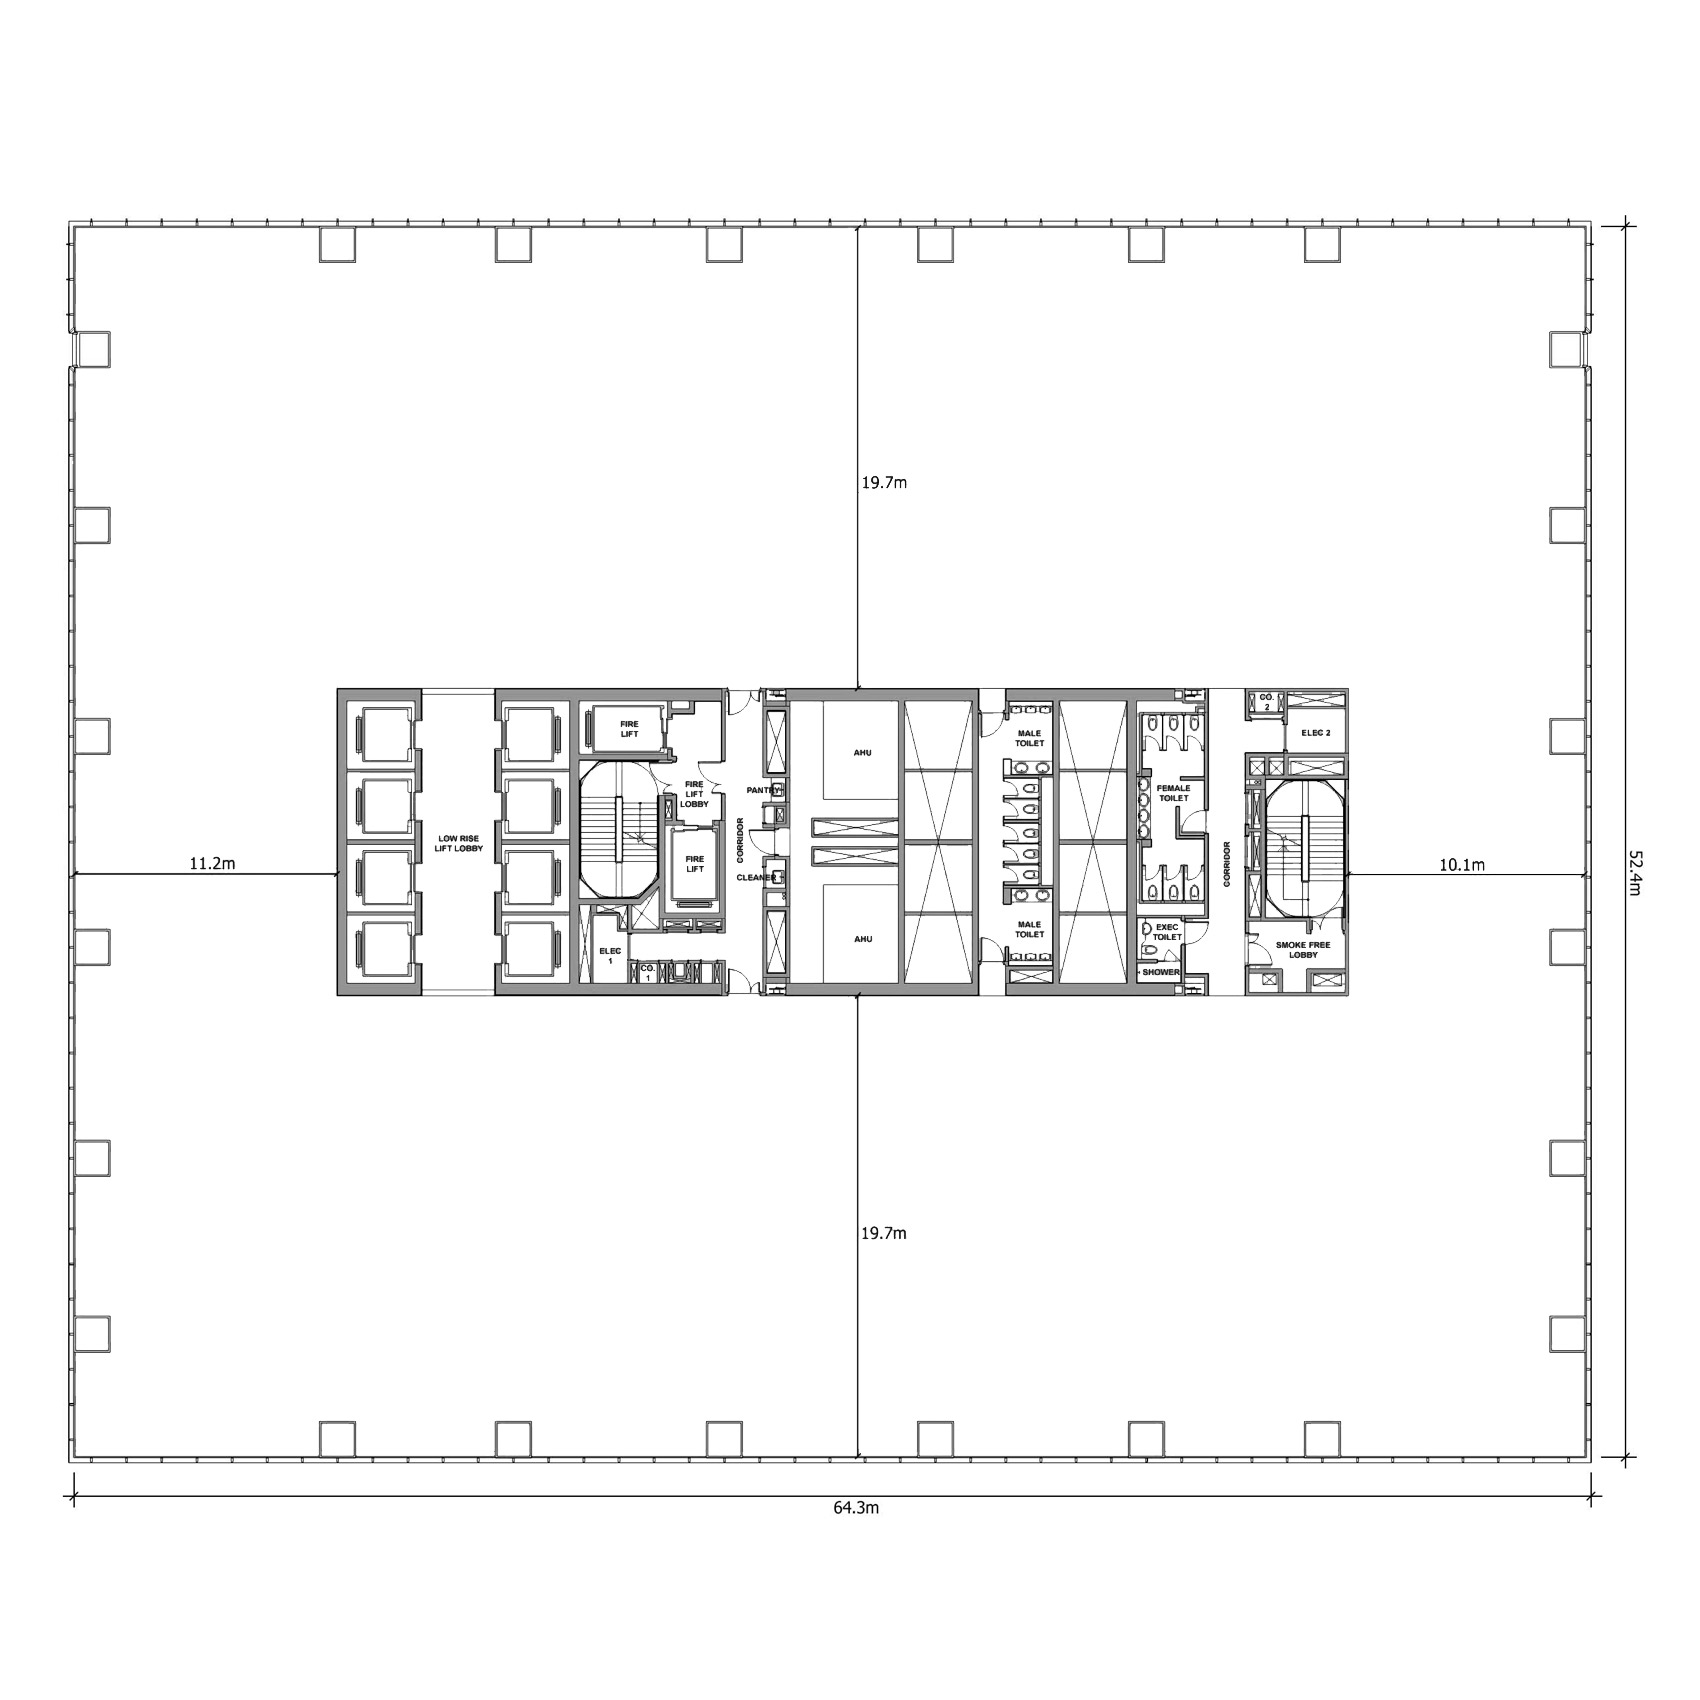 Home Design Layout Pdf Low Plan Misfits Architecture